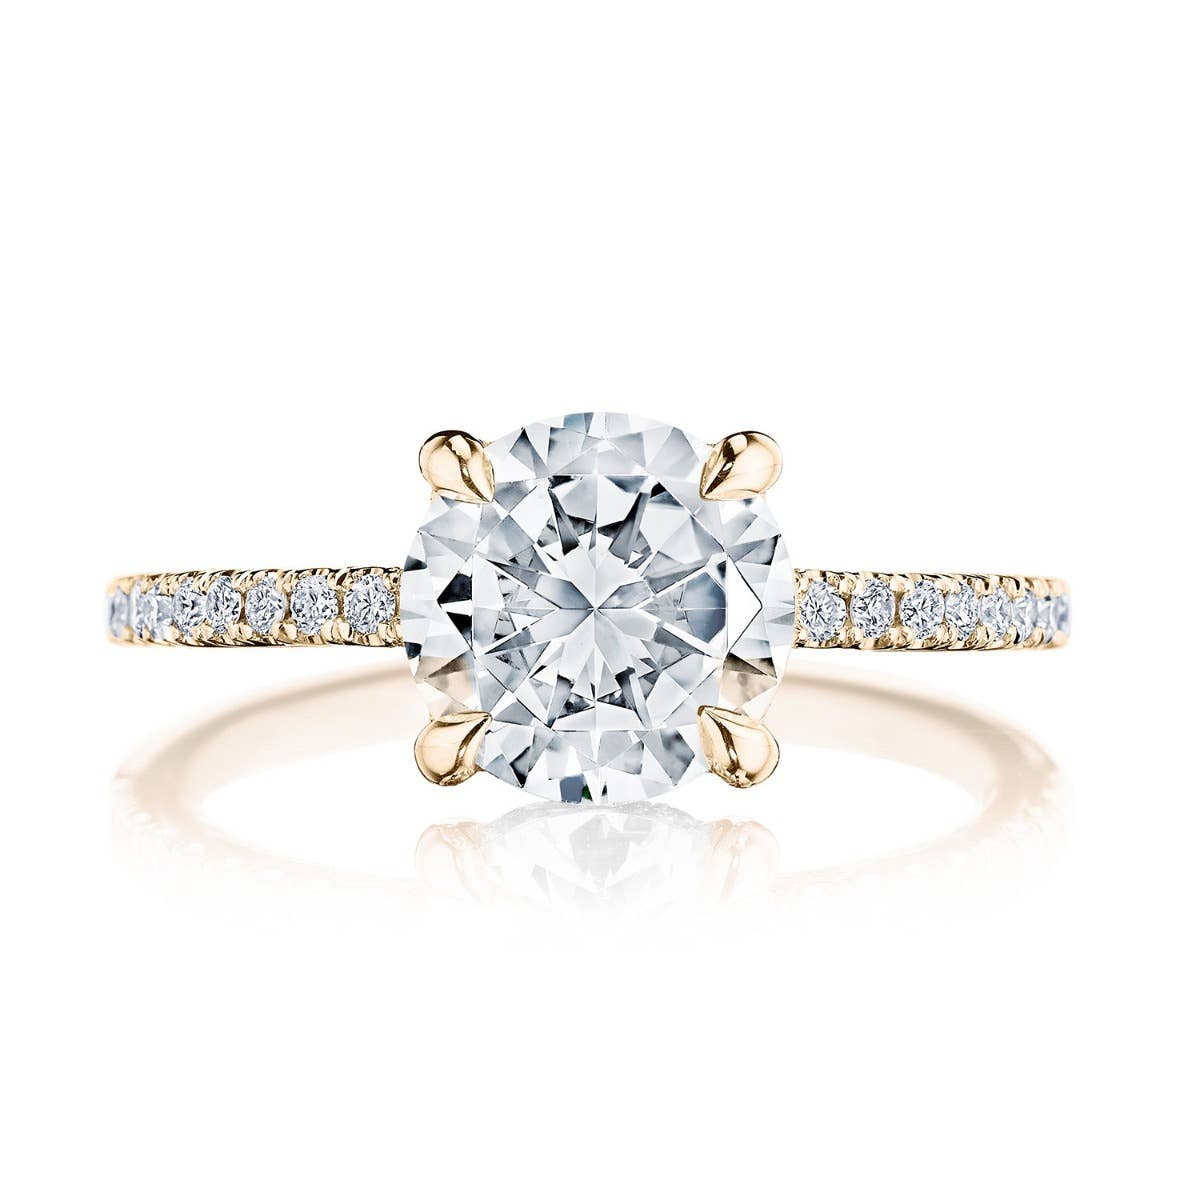 Simply Tacori engagement ring from Tacori